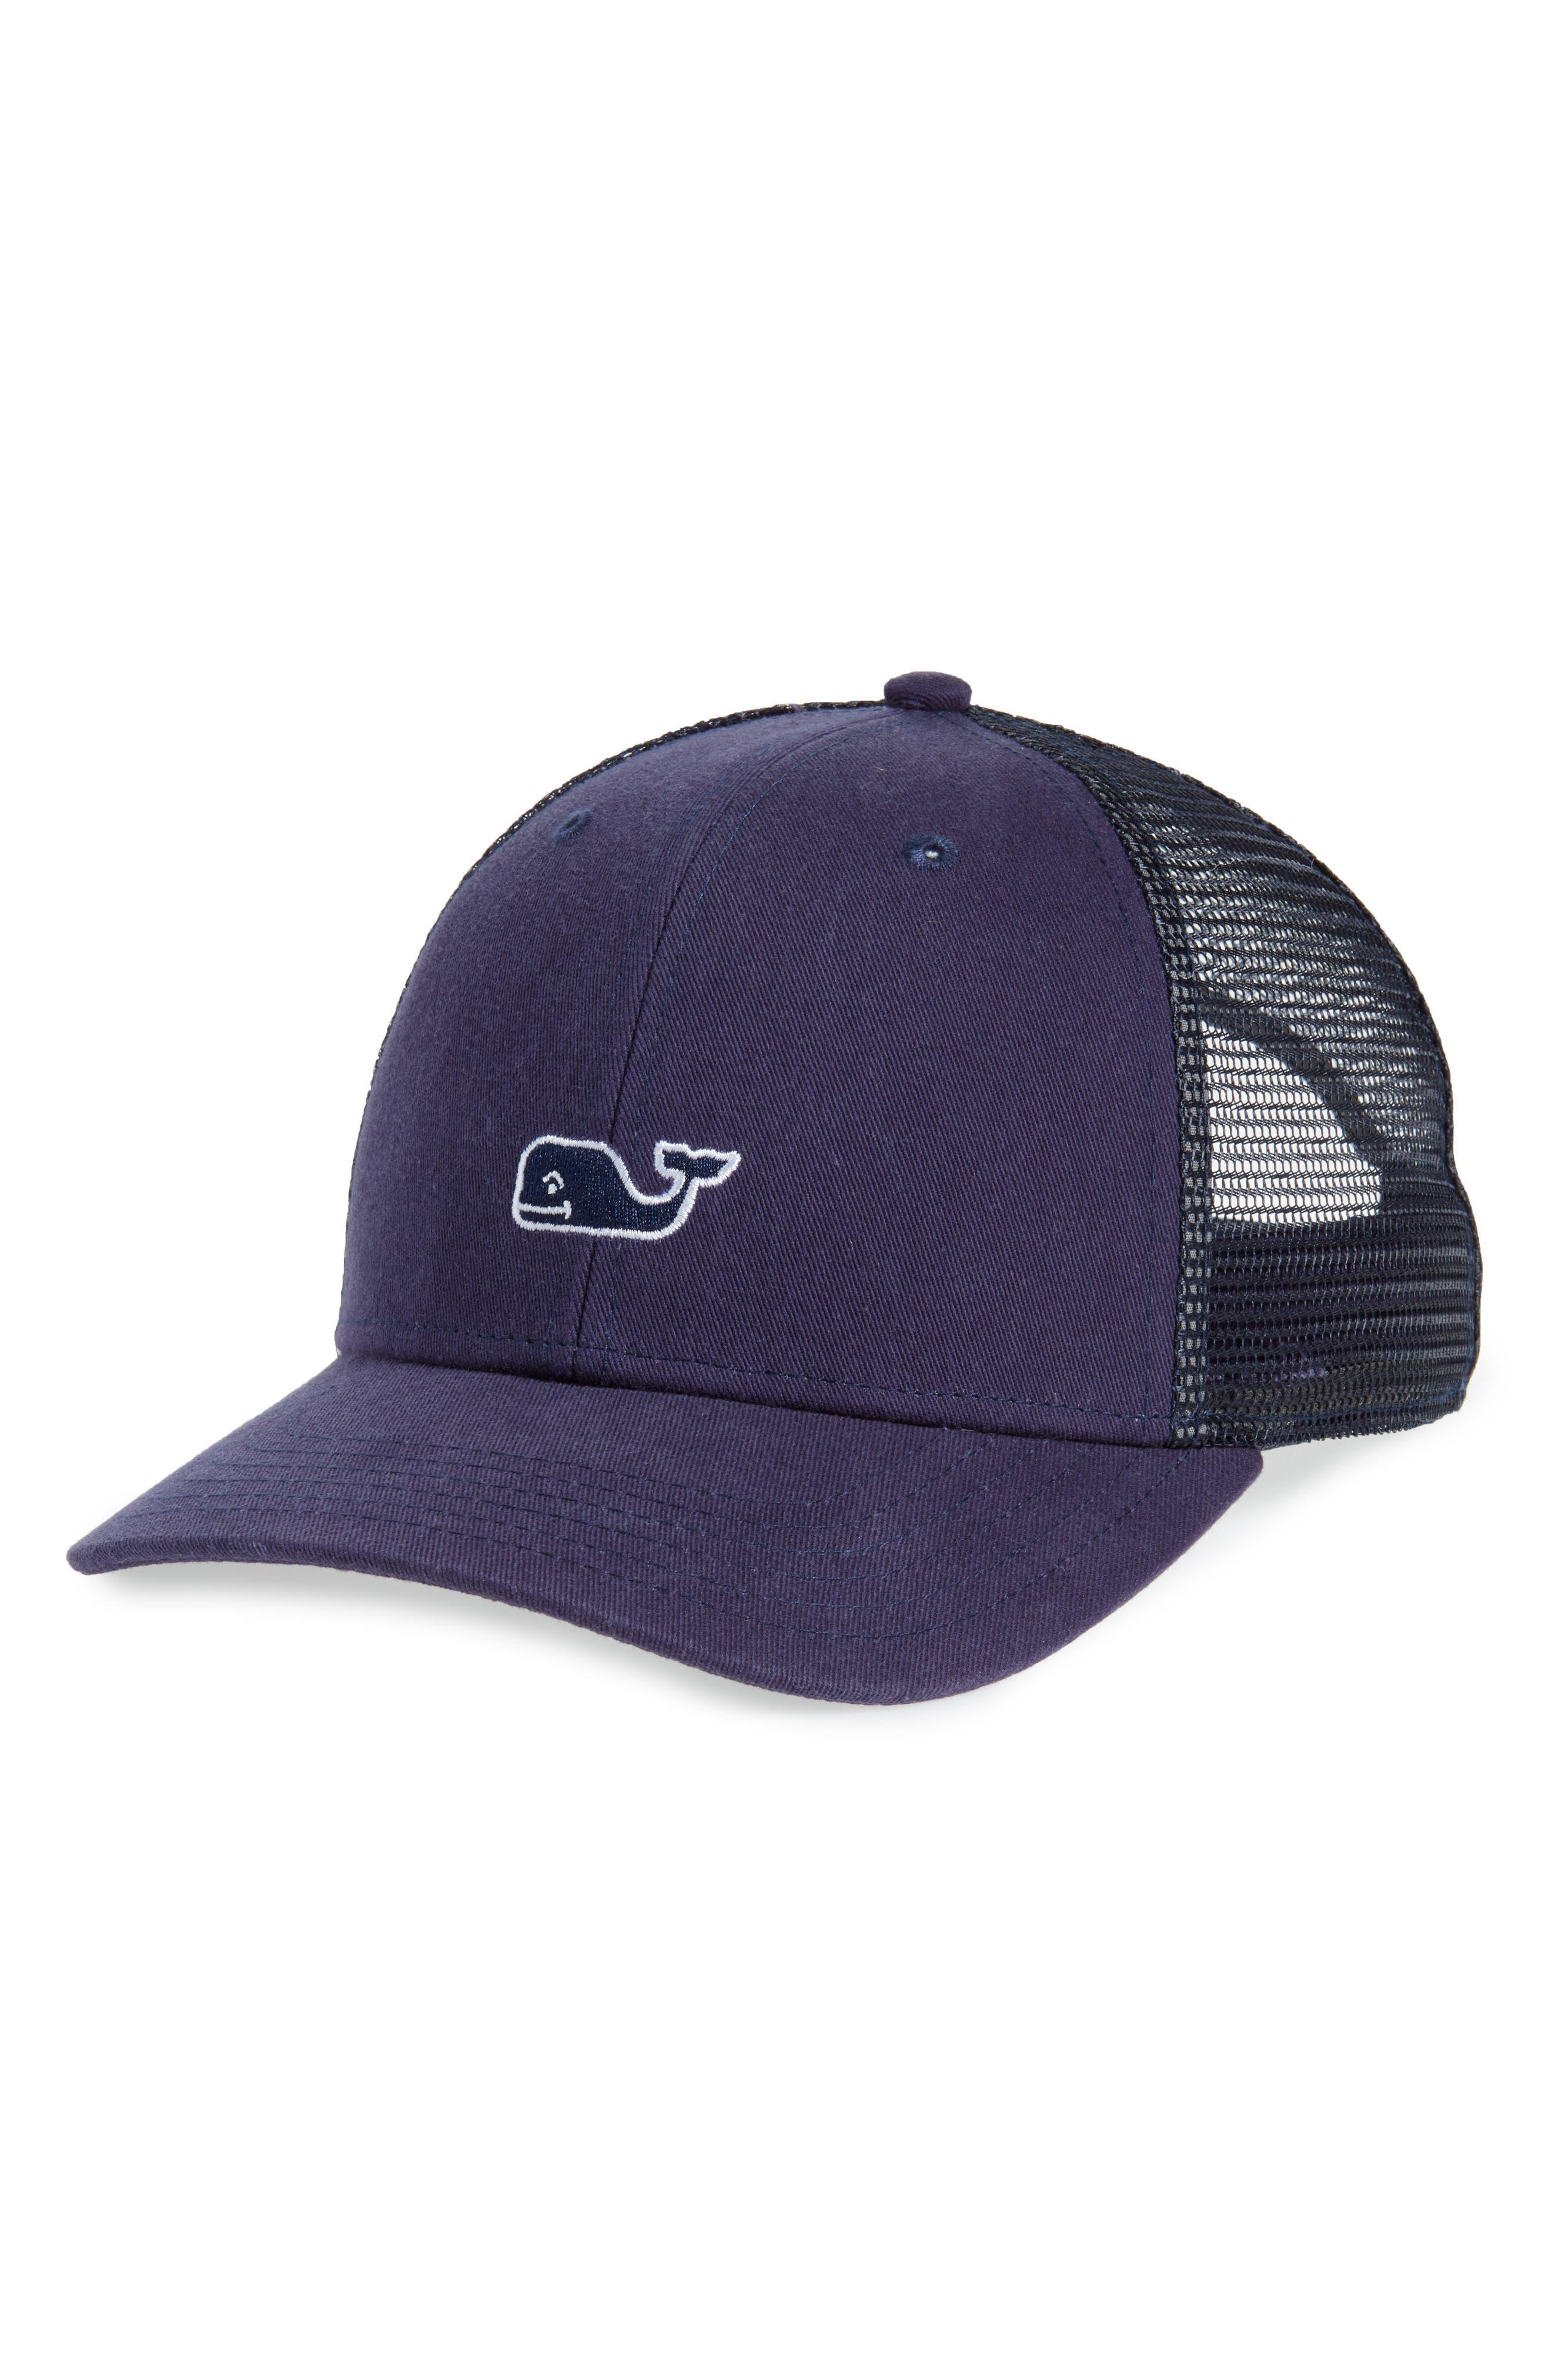 vineyard vines High Profile Trucker Hat